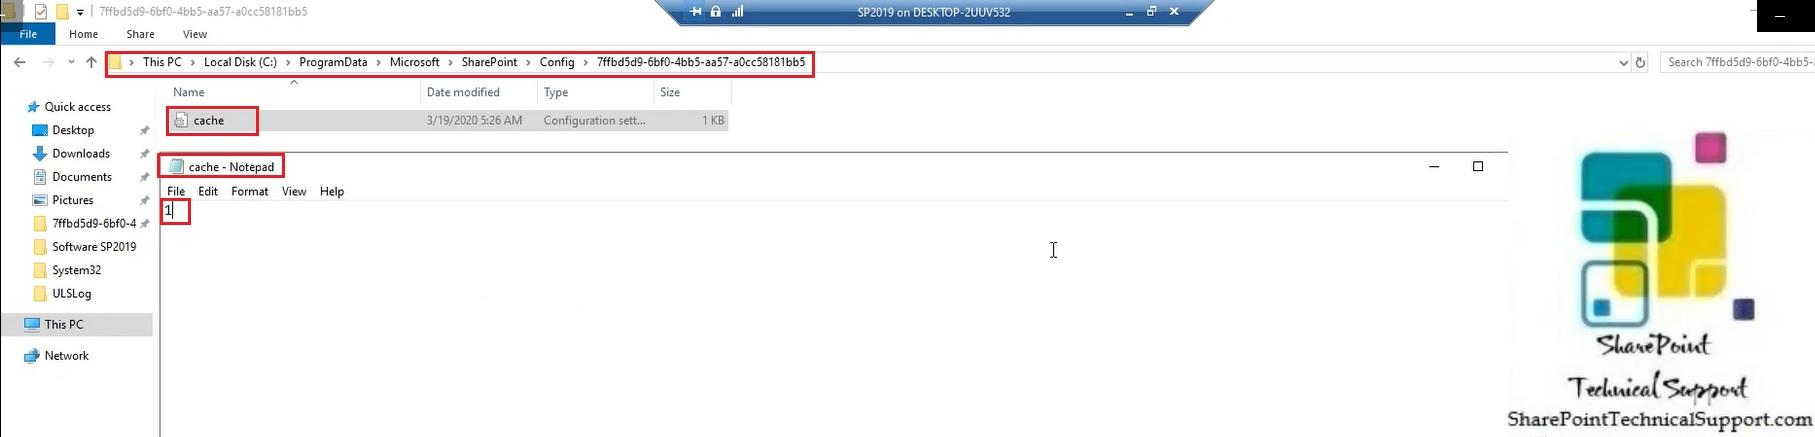 edit the vluse present under file cache